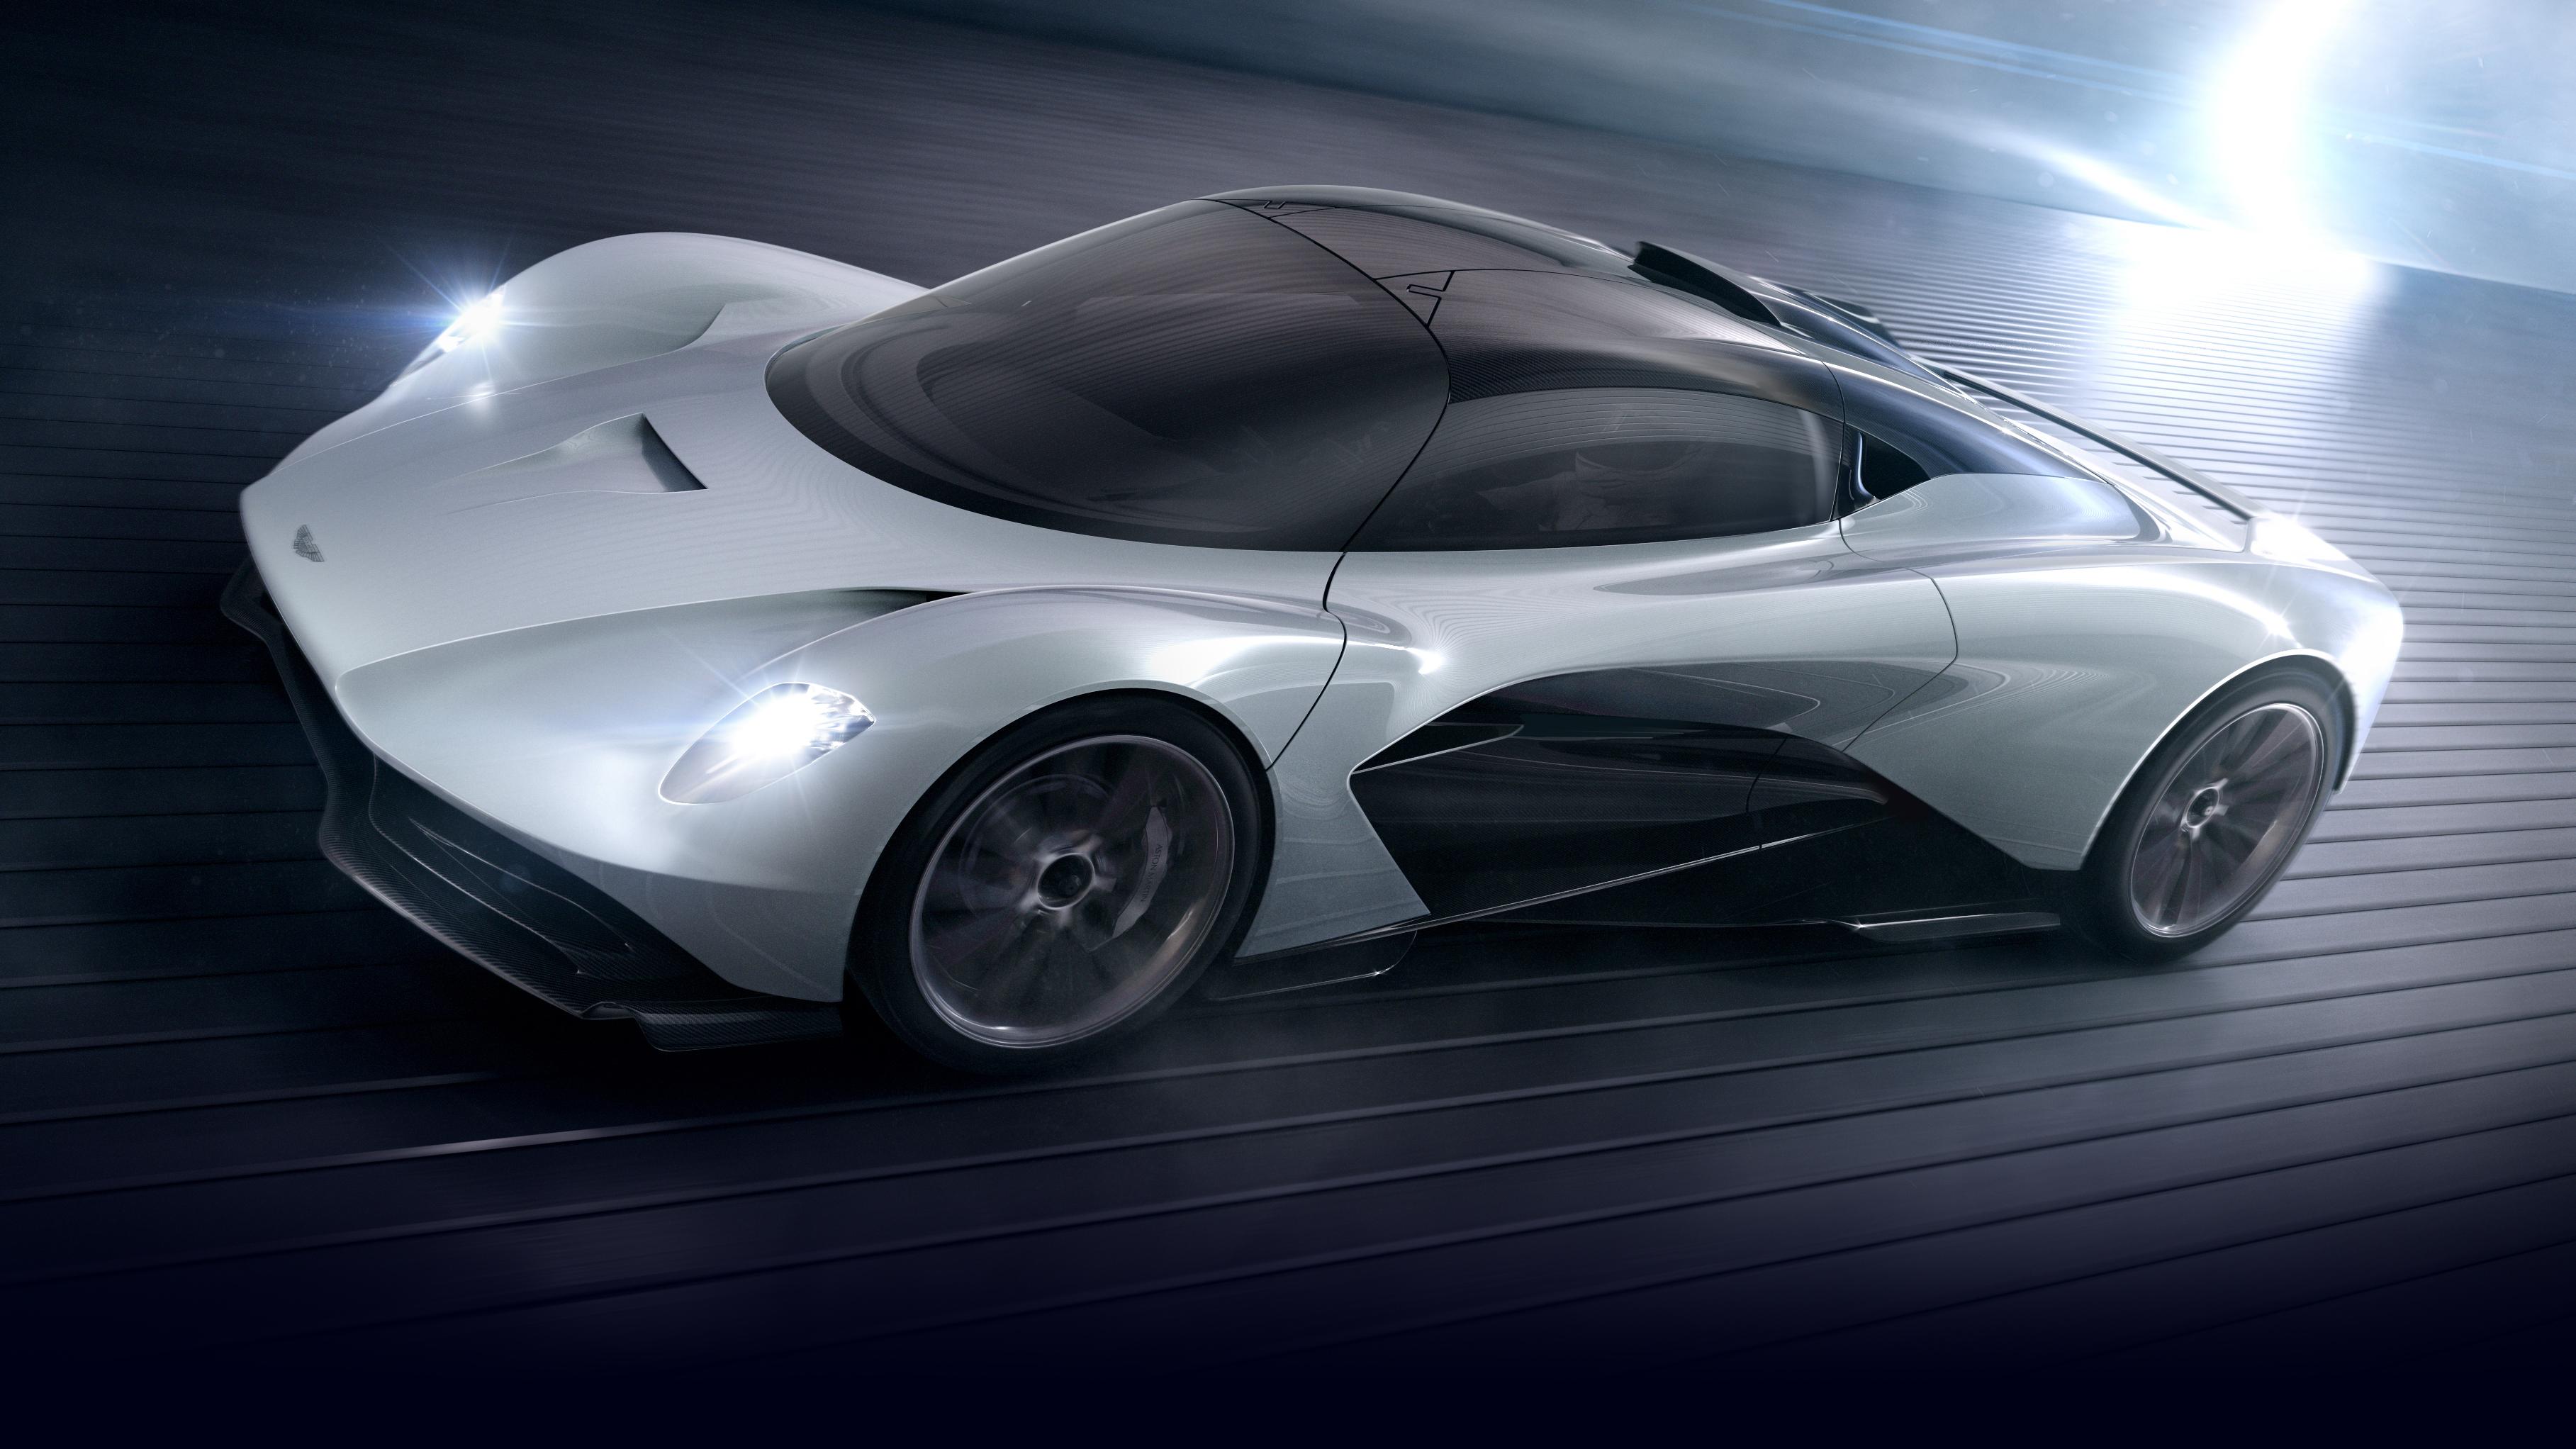 Aston-Martin AM-RB 003 revealed - Cars news - NewsLocker